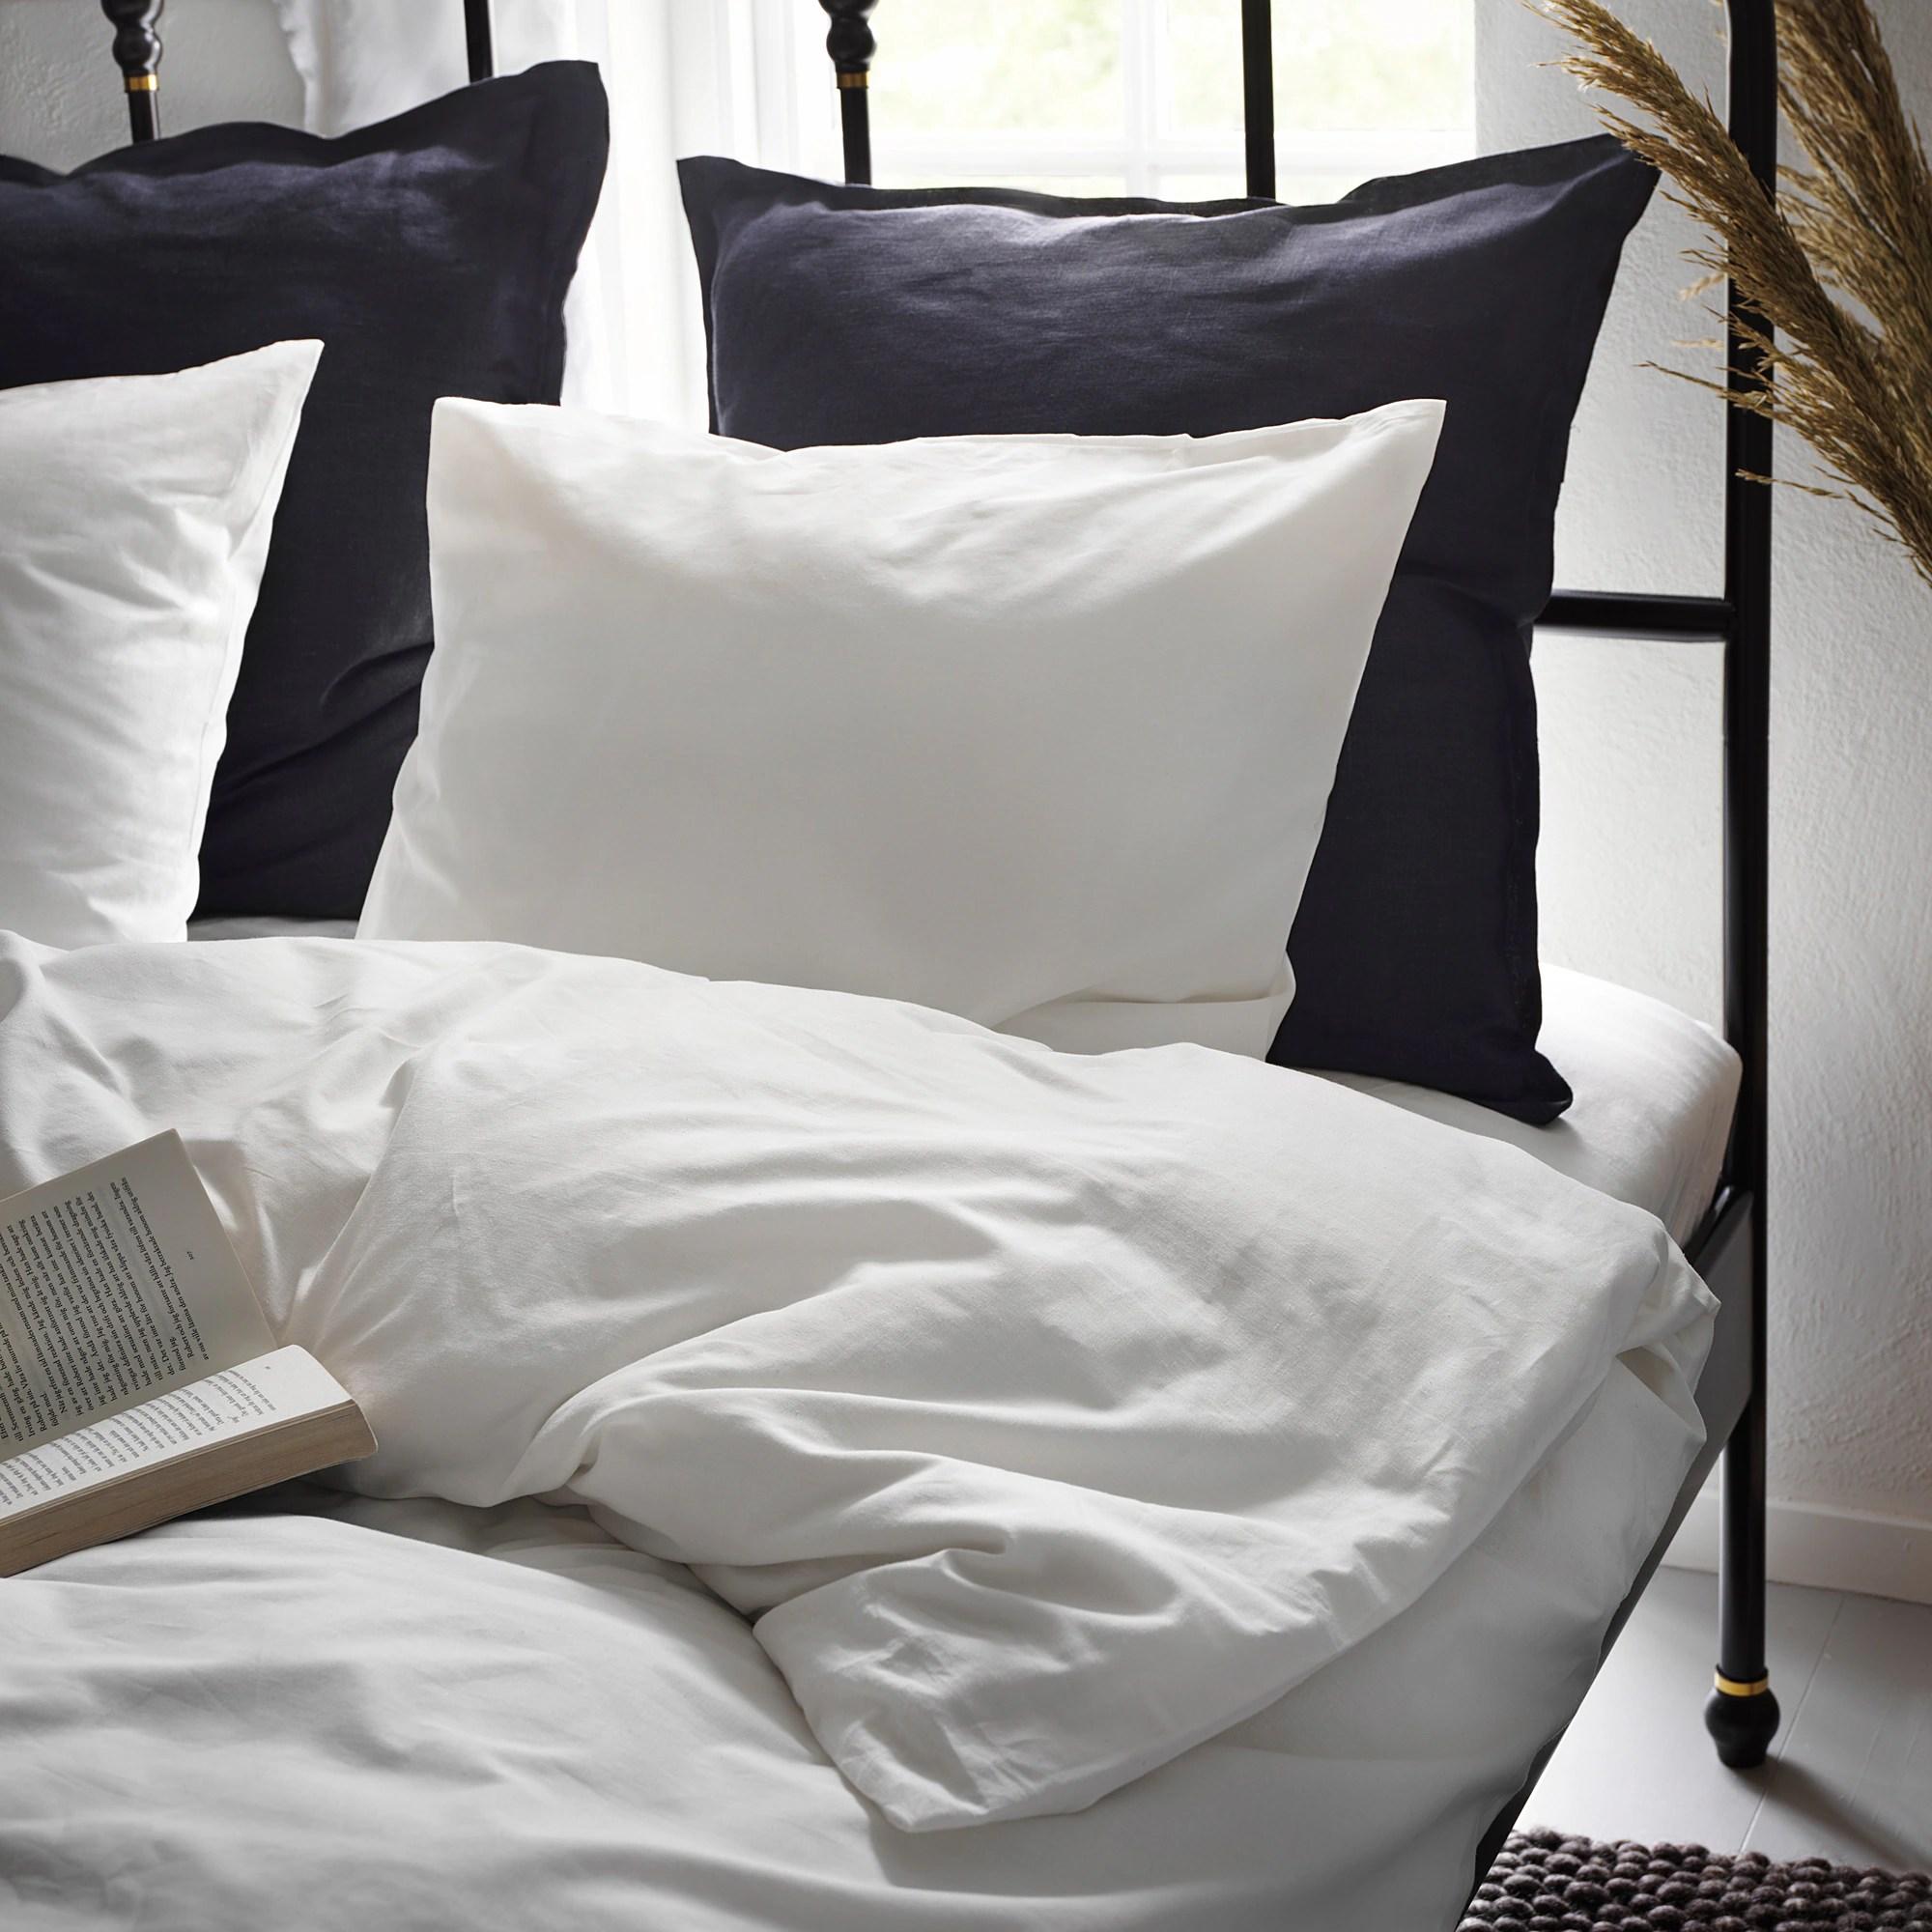 dvala duvet cover and pillowcase s white full queen double queen